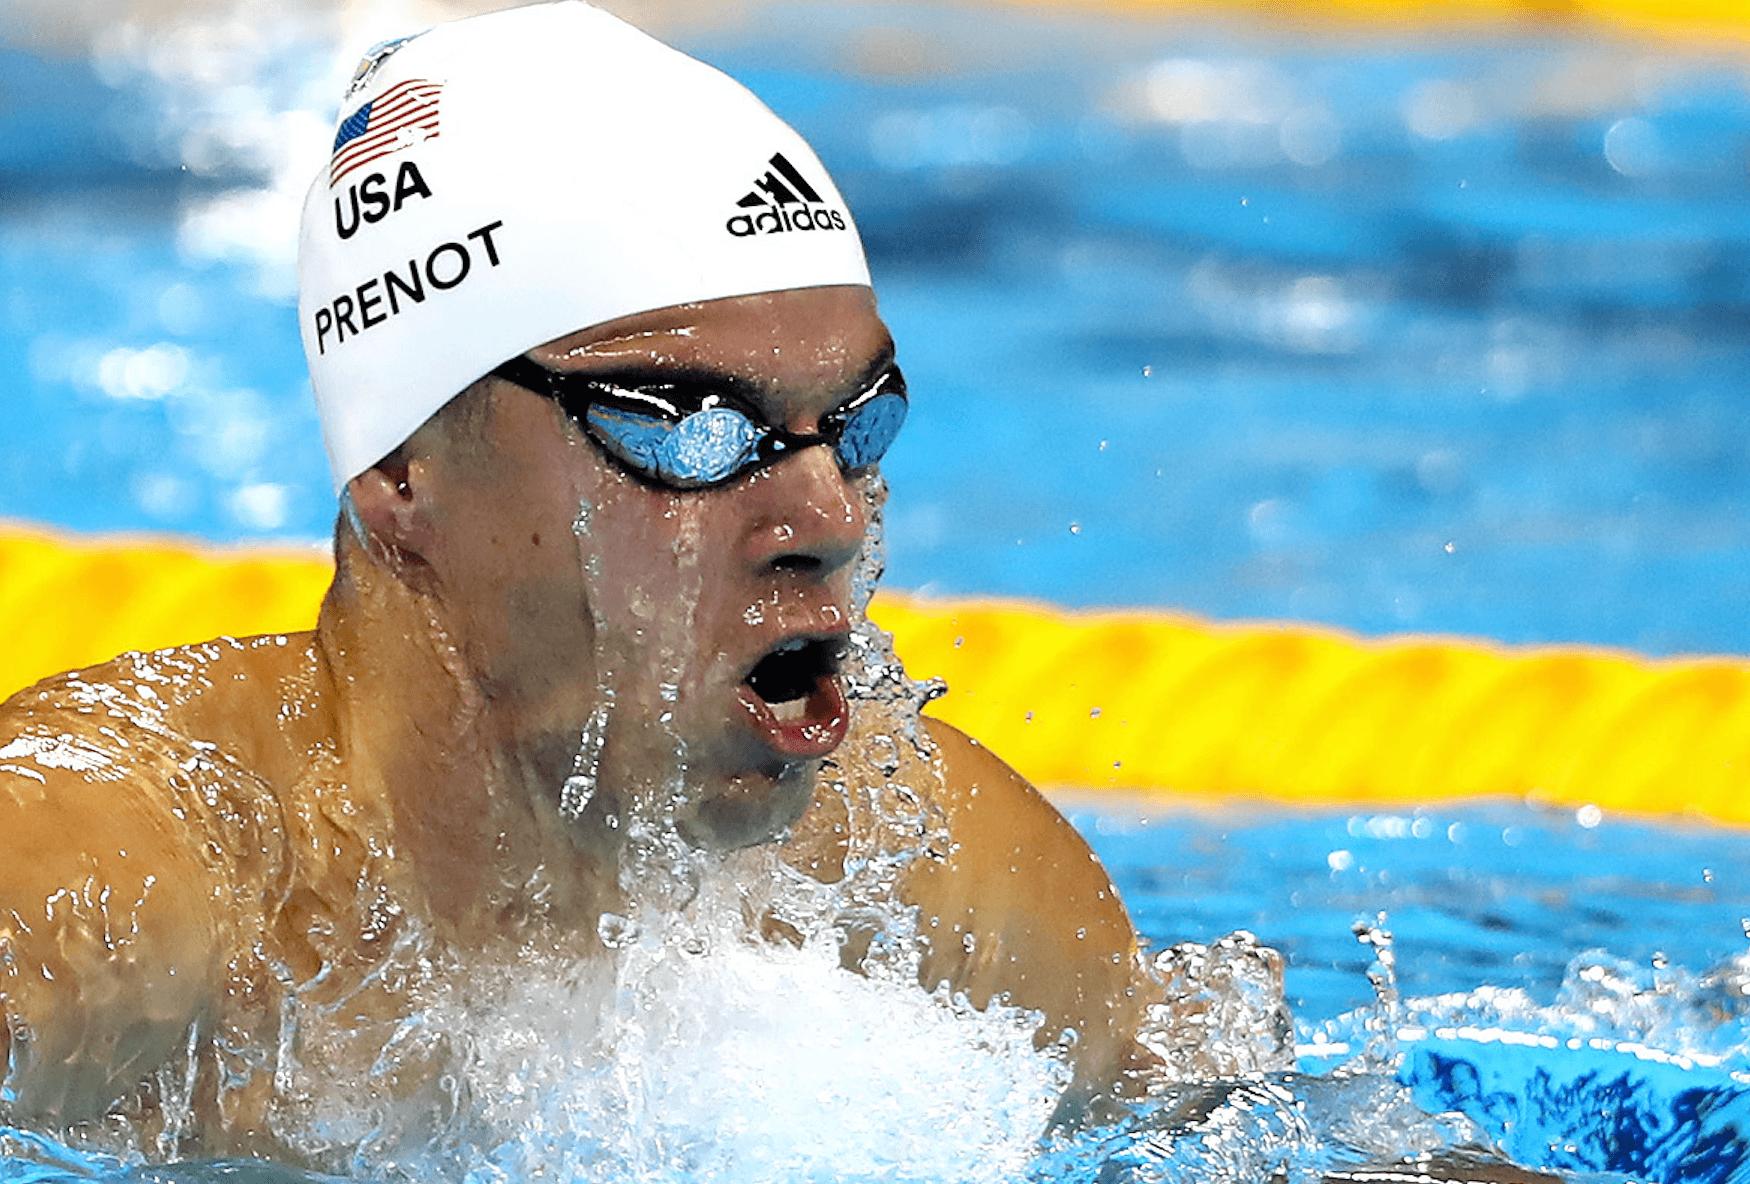 tritonwear race analysis 2016 olympics mens 200 breaststroke